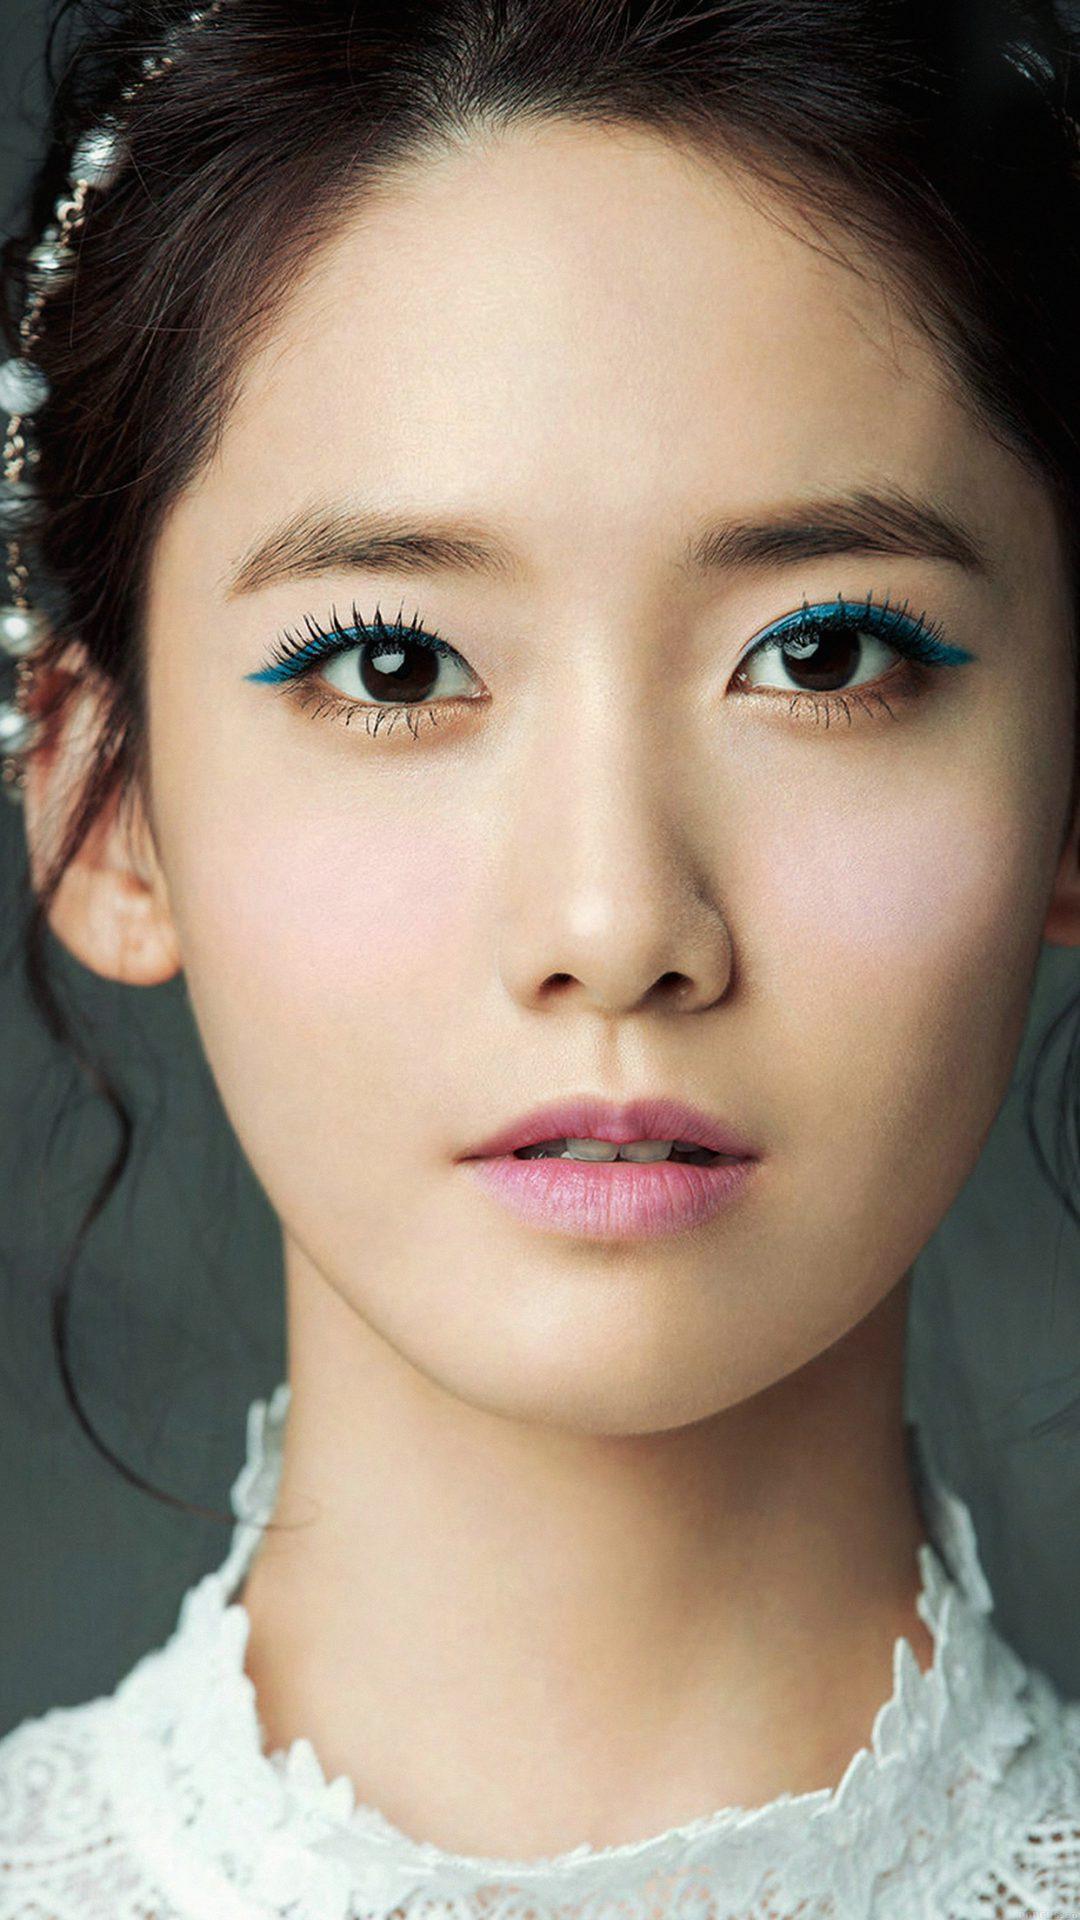 Yuna Yoona Snsd Kpop Girl Cute Music